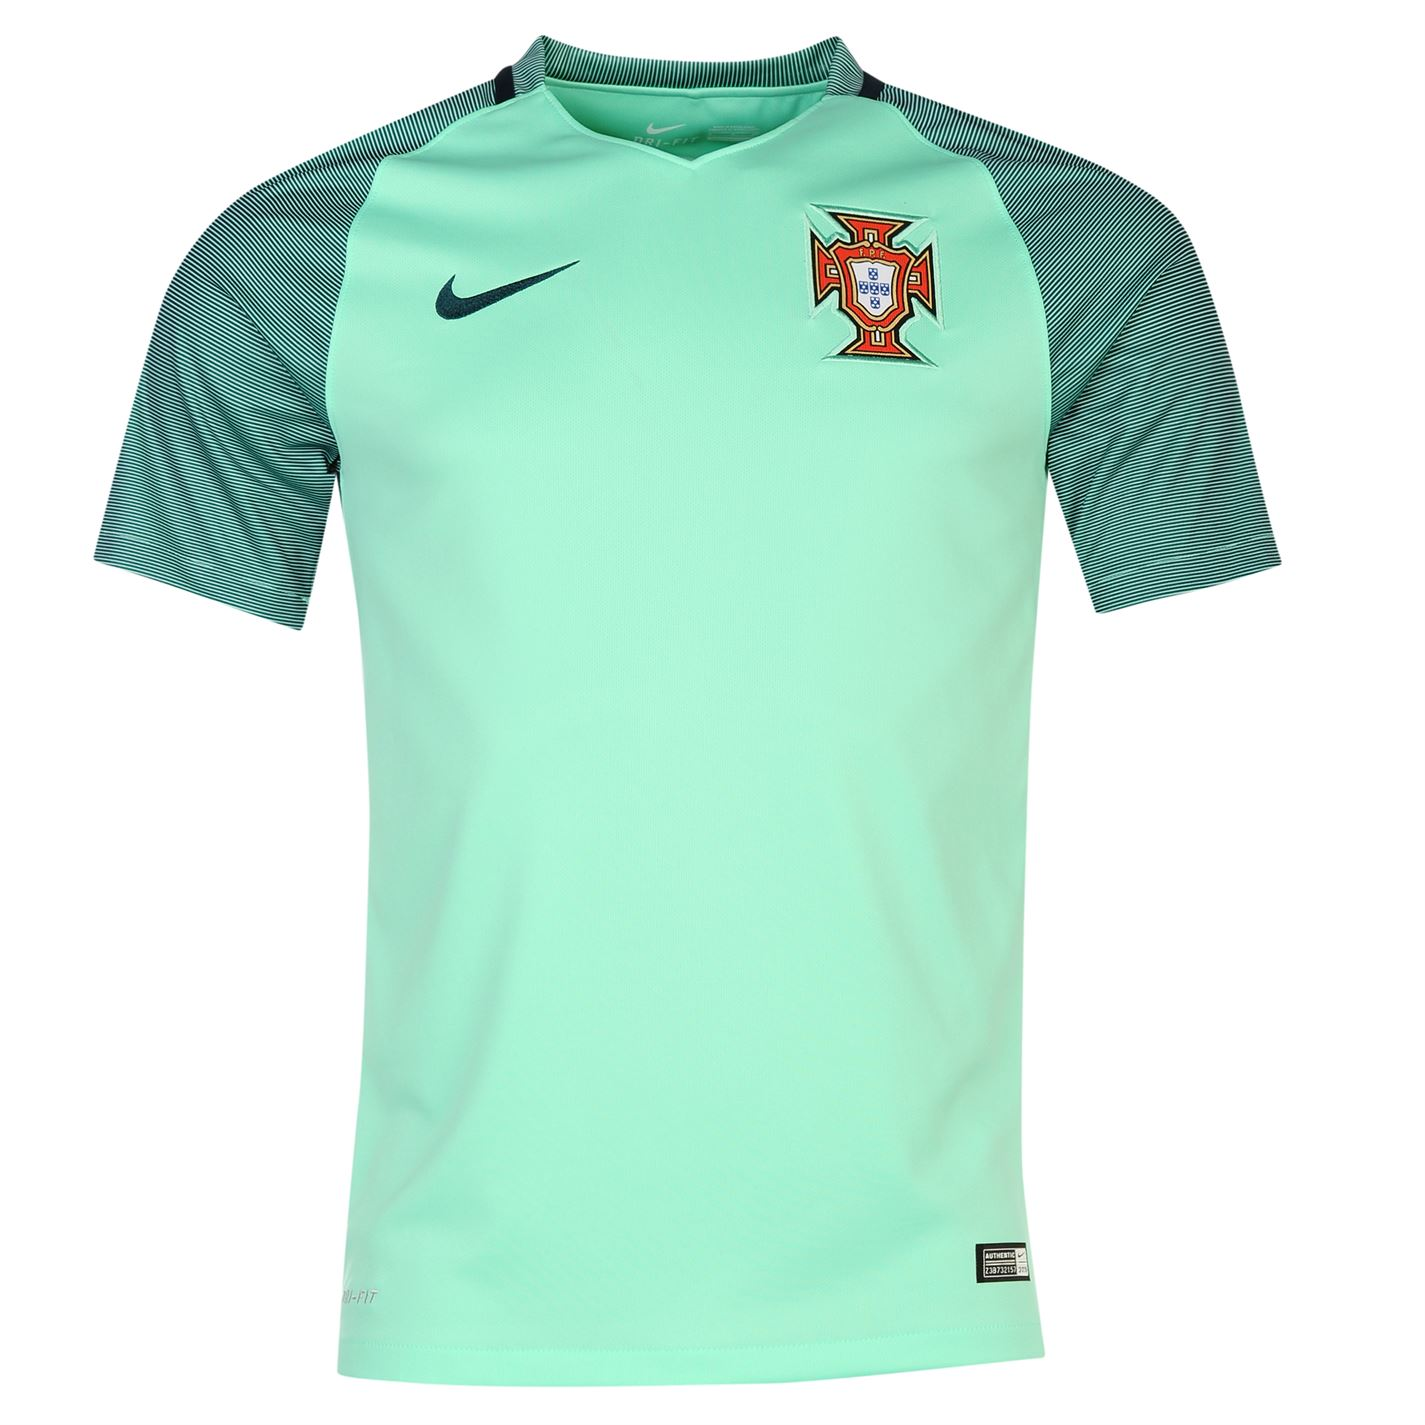 c8738007e ... portugal-2016-2017-nike-away-football-kit